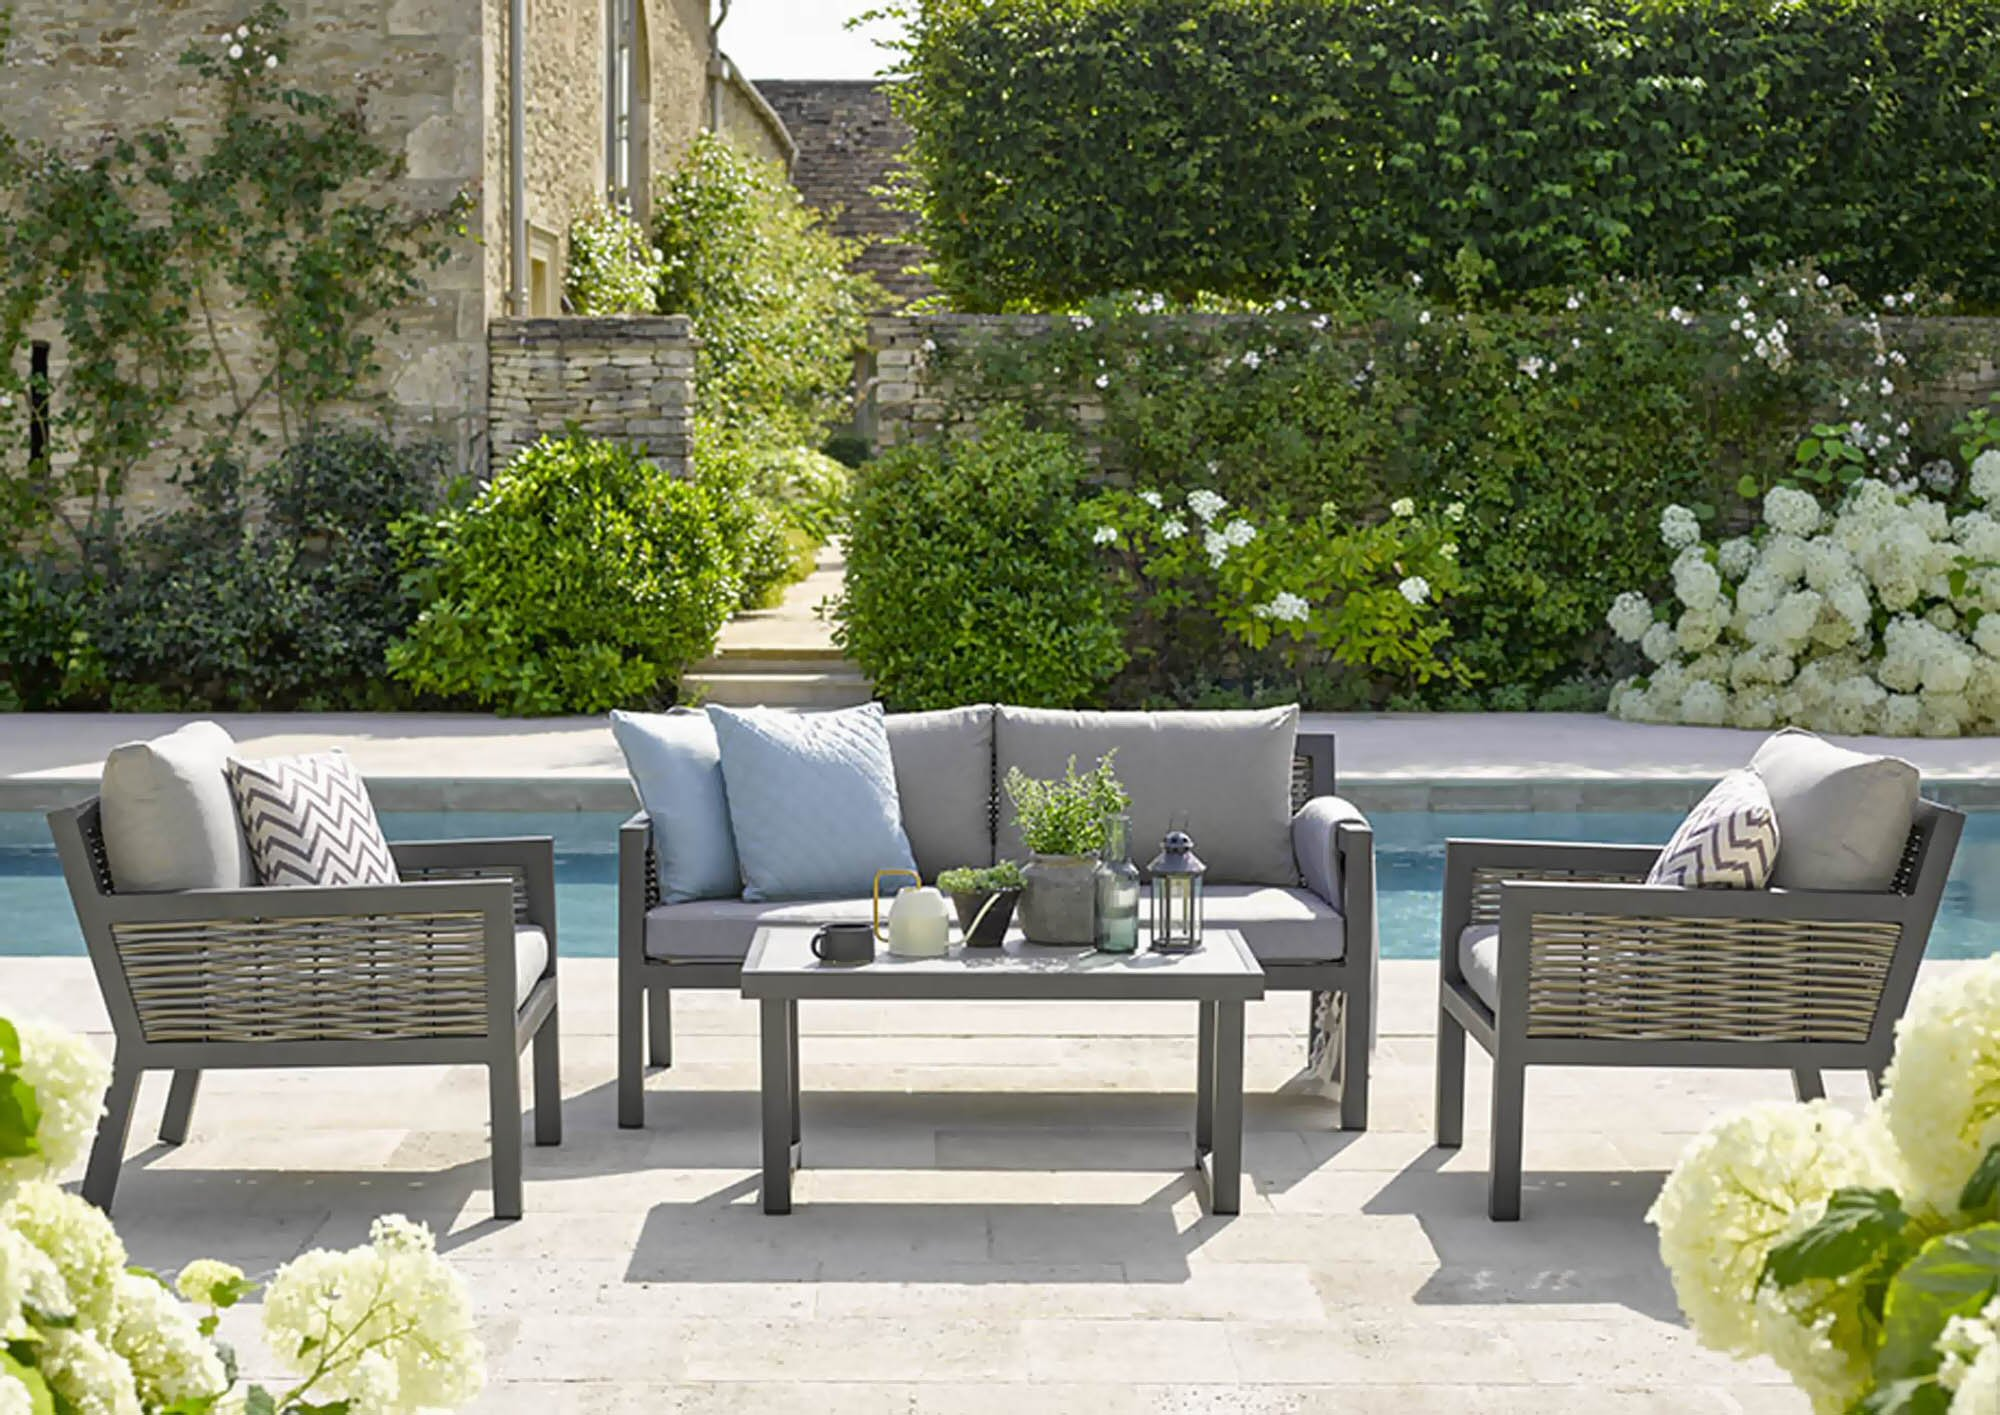 Bramblecrest Portofino 2 Seater Sofa with 2 Armchairs & Rectangle Ceramic Top Coffee Table